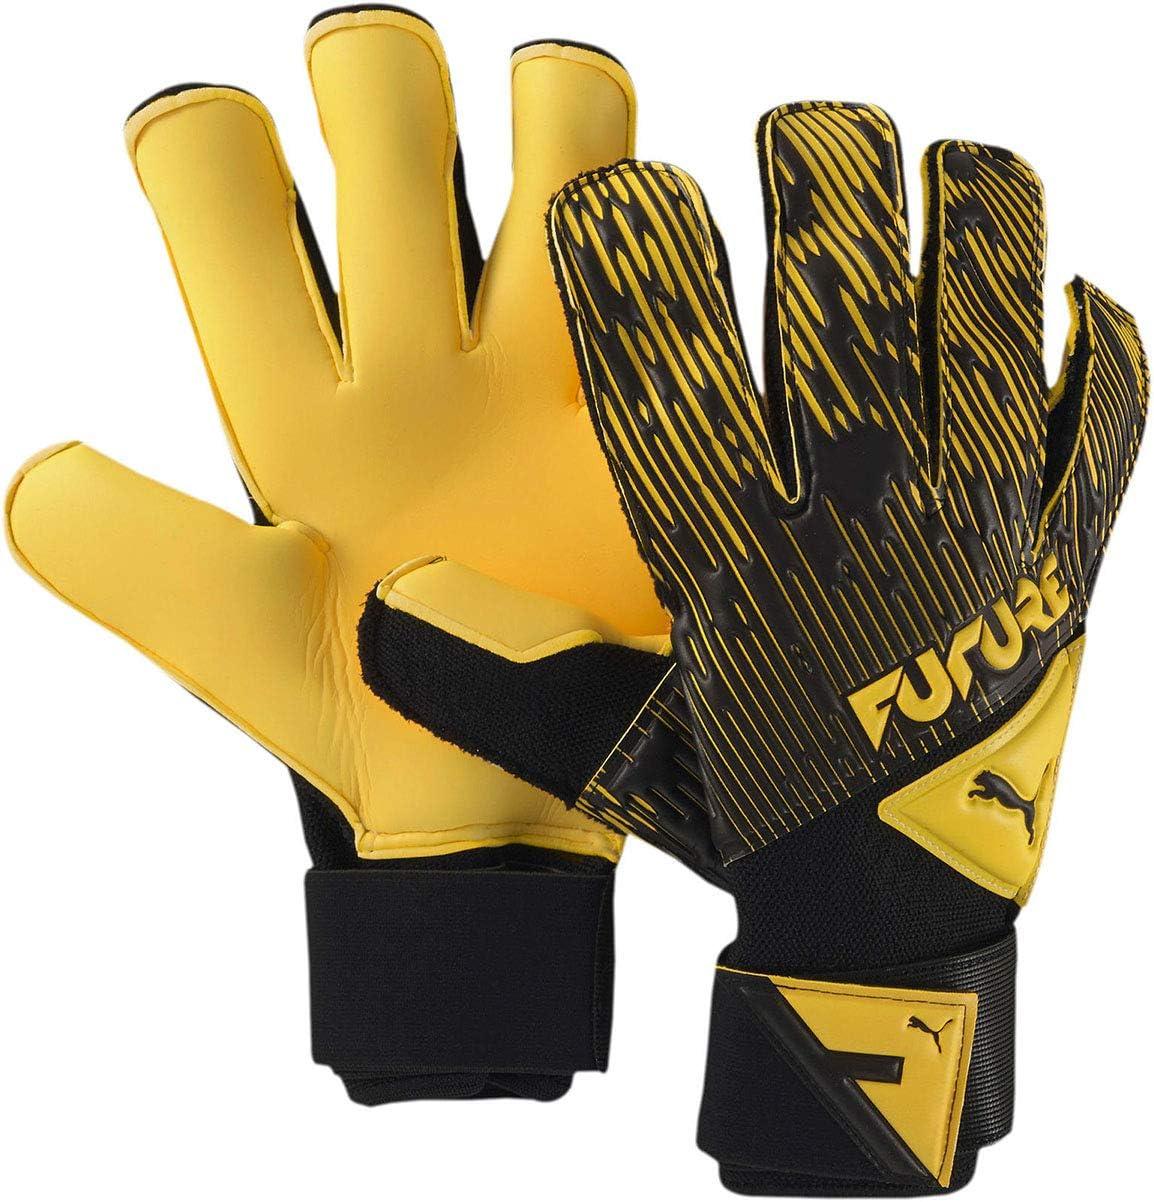 Future Grip 5.2 SGC Glove, Ultra Yellow-Puma Black-Puma White